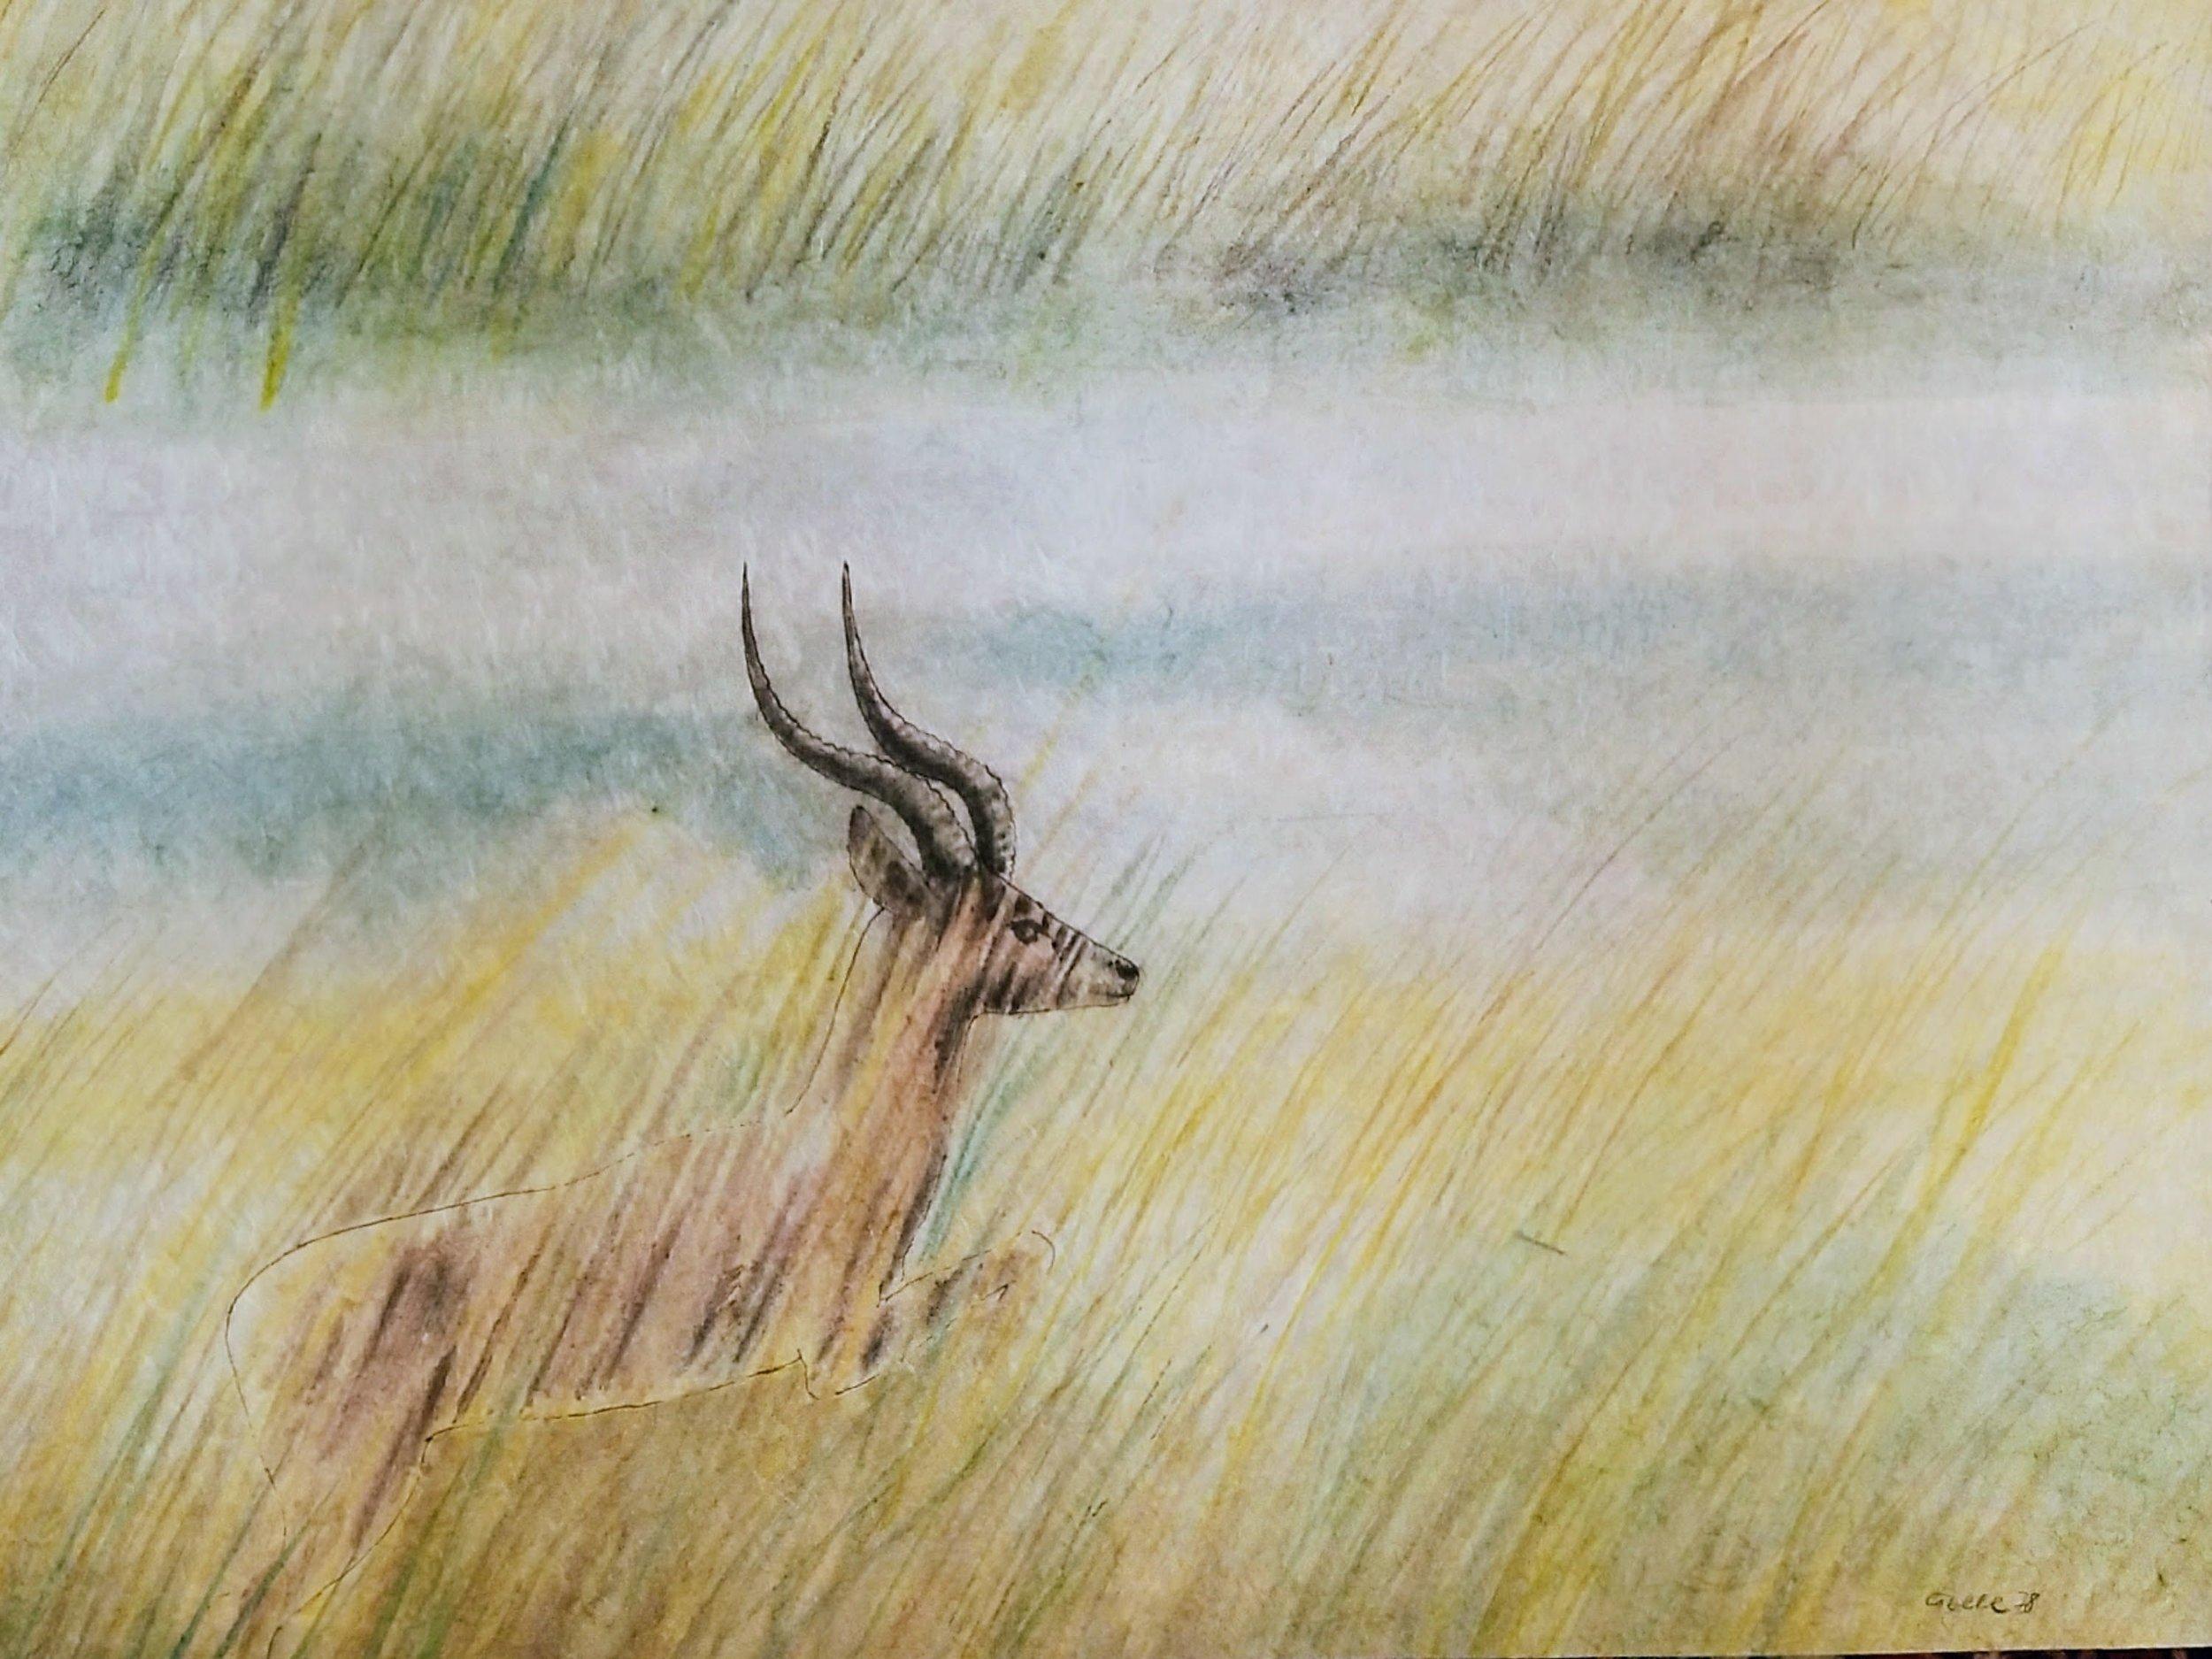 Wasserantilope (Ugandakob) im Schilfgras / Waterbuck (Ugandan kob) in Reeds